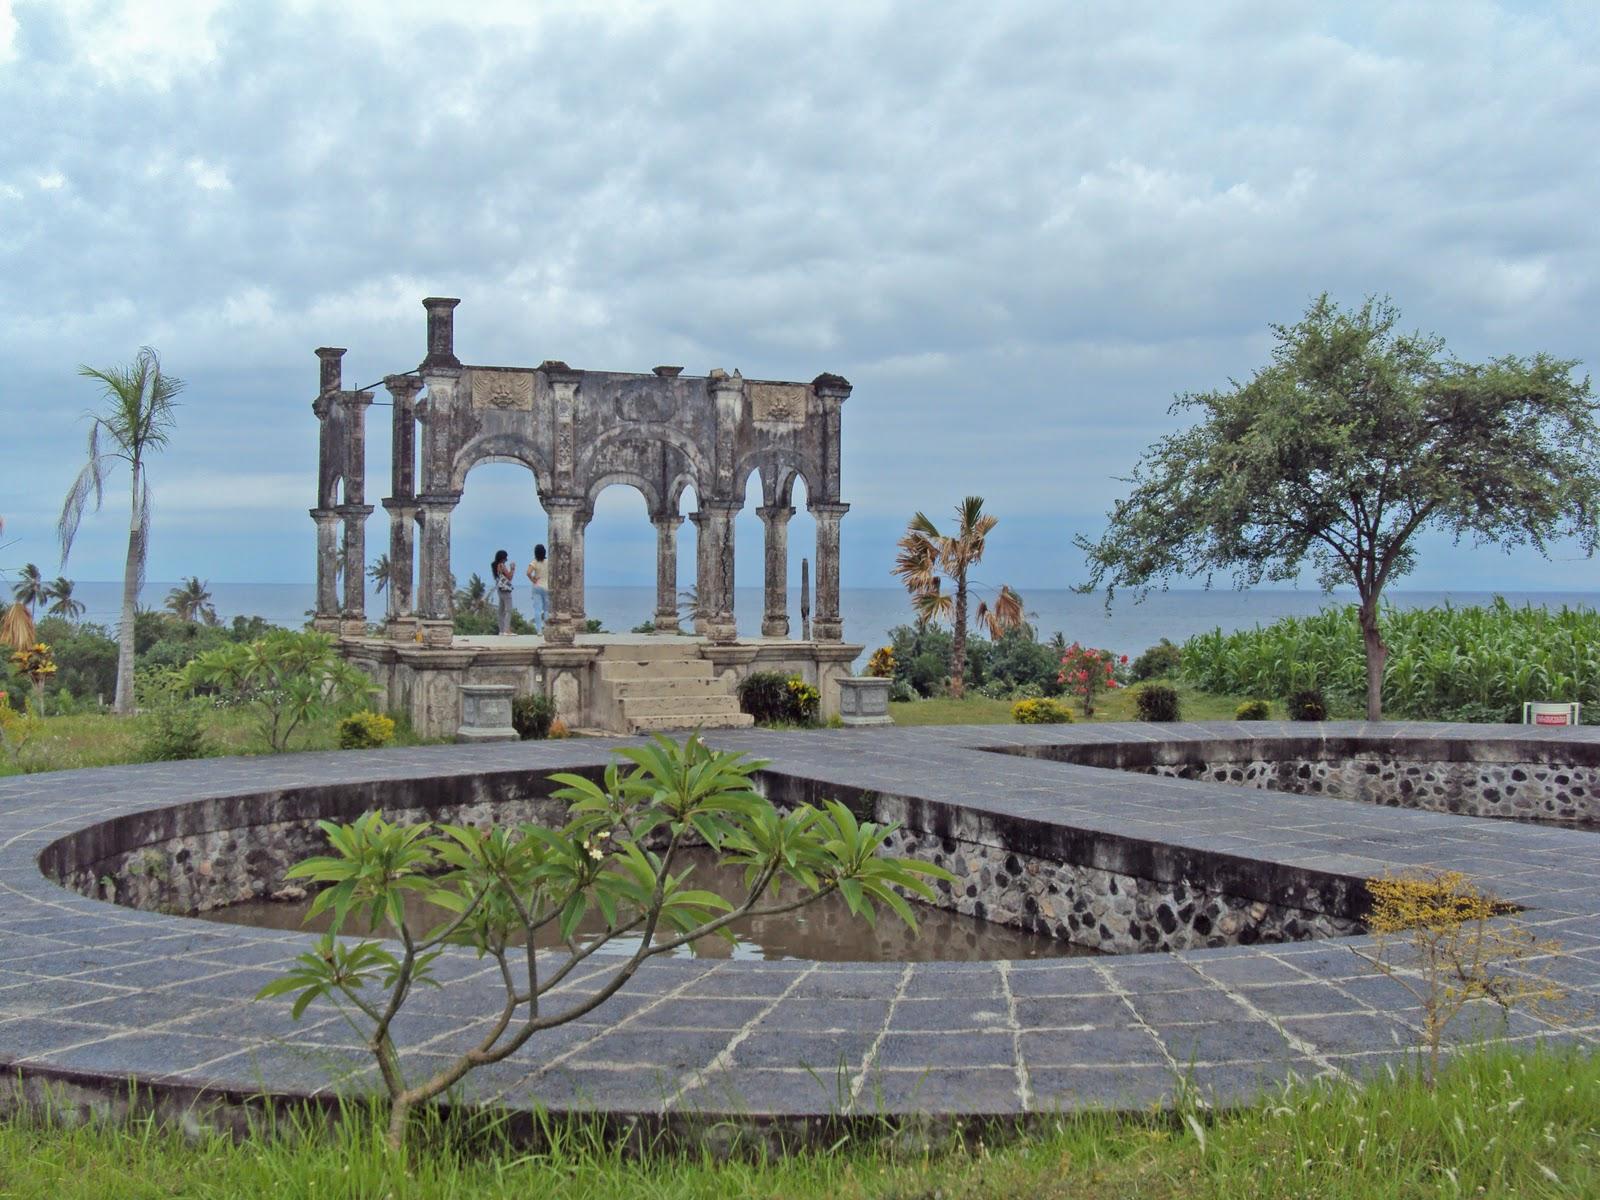 Liburan Situs Wisata Populer Kabupaten Karangasem Bali Taman Ujung Pantai